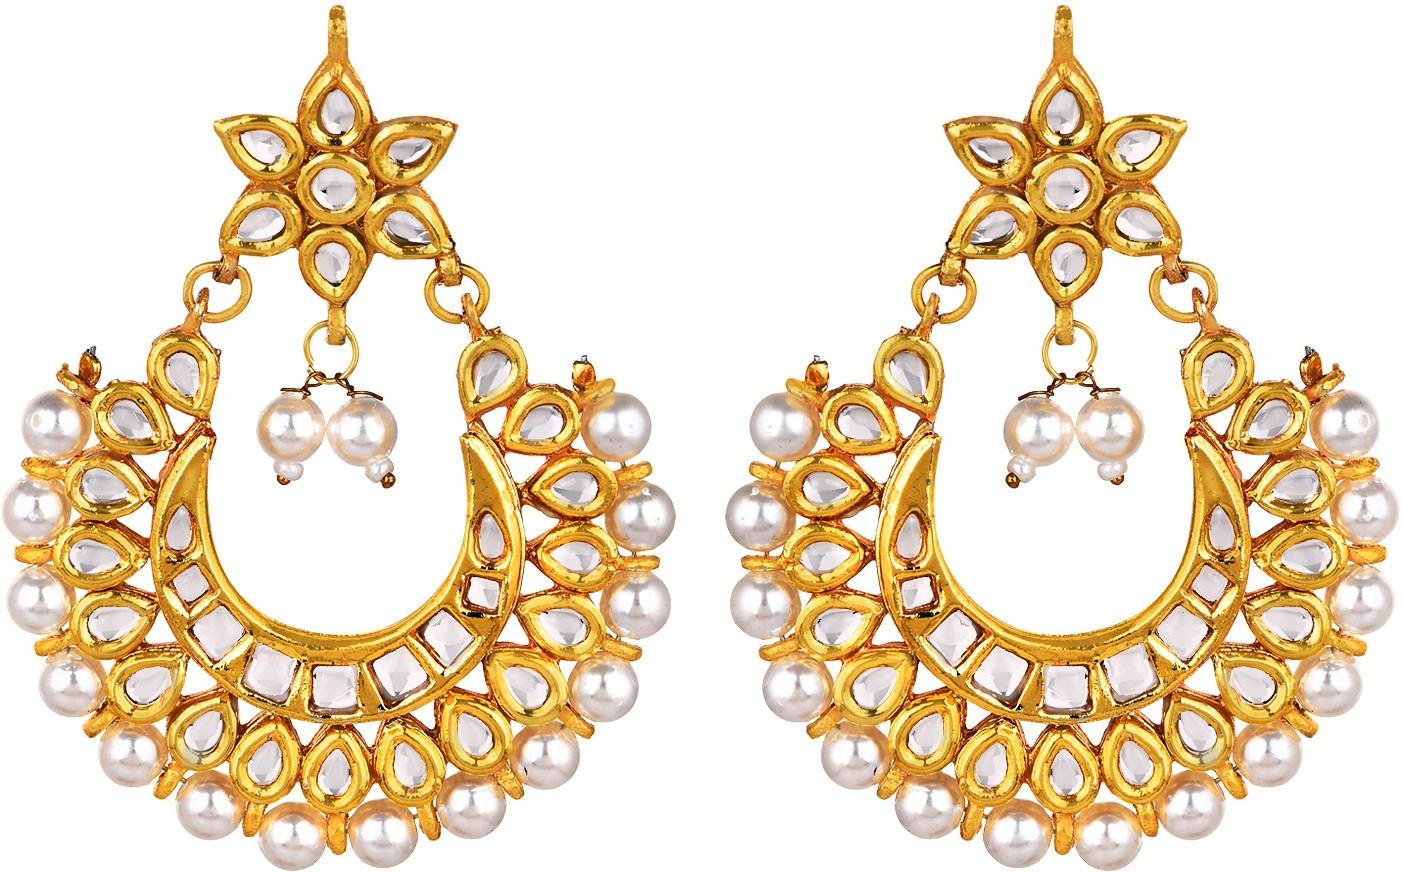 Deals - Delhi - Minimum 70% Off <br> Earrings, Pendants, Bracelets.<br> Category - jewellery<br> Business - Flipkart.com